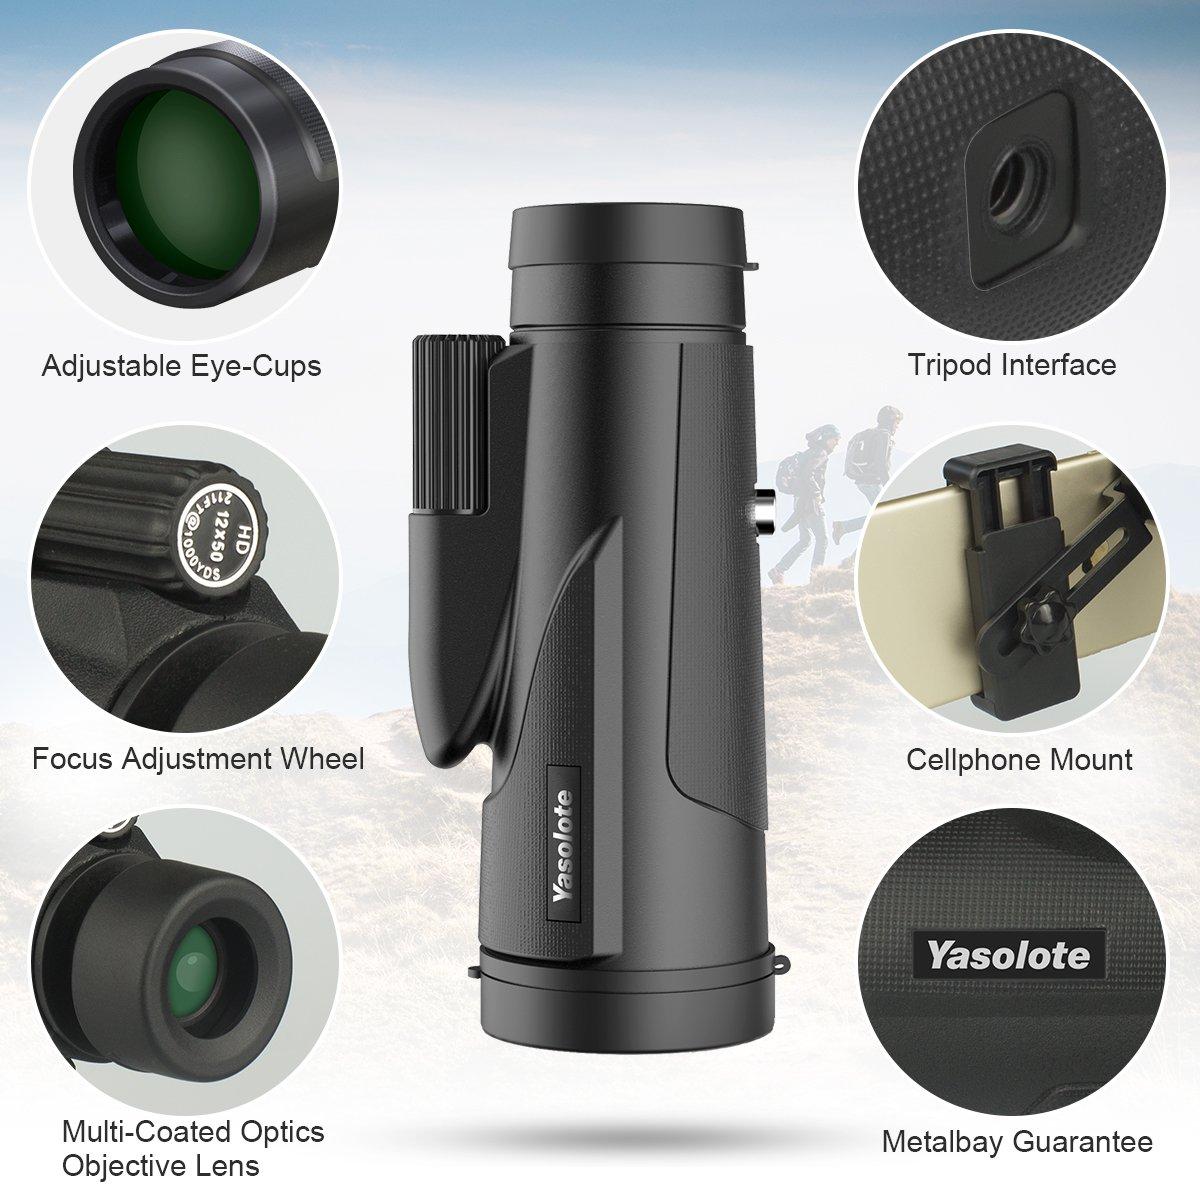 Yasolote Monocular Telescopio 12X50 HD con Prisma BAK4 Catalejo Impermeable para Tel/éfono M/óvil Dise/ño de Prismatico de un Solo Visor para Partido de F/útbol P/ájaros Turismo Caza y Navegaci/ón